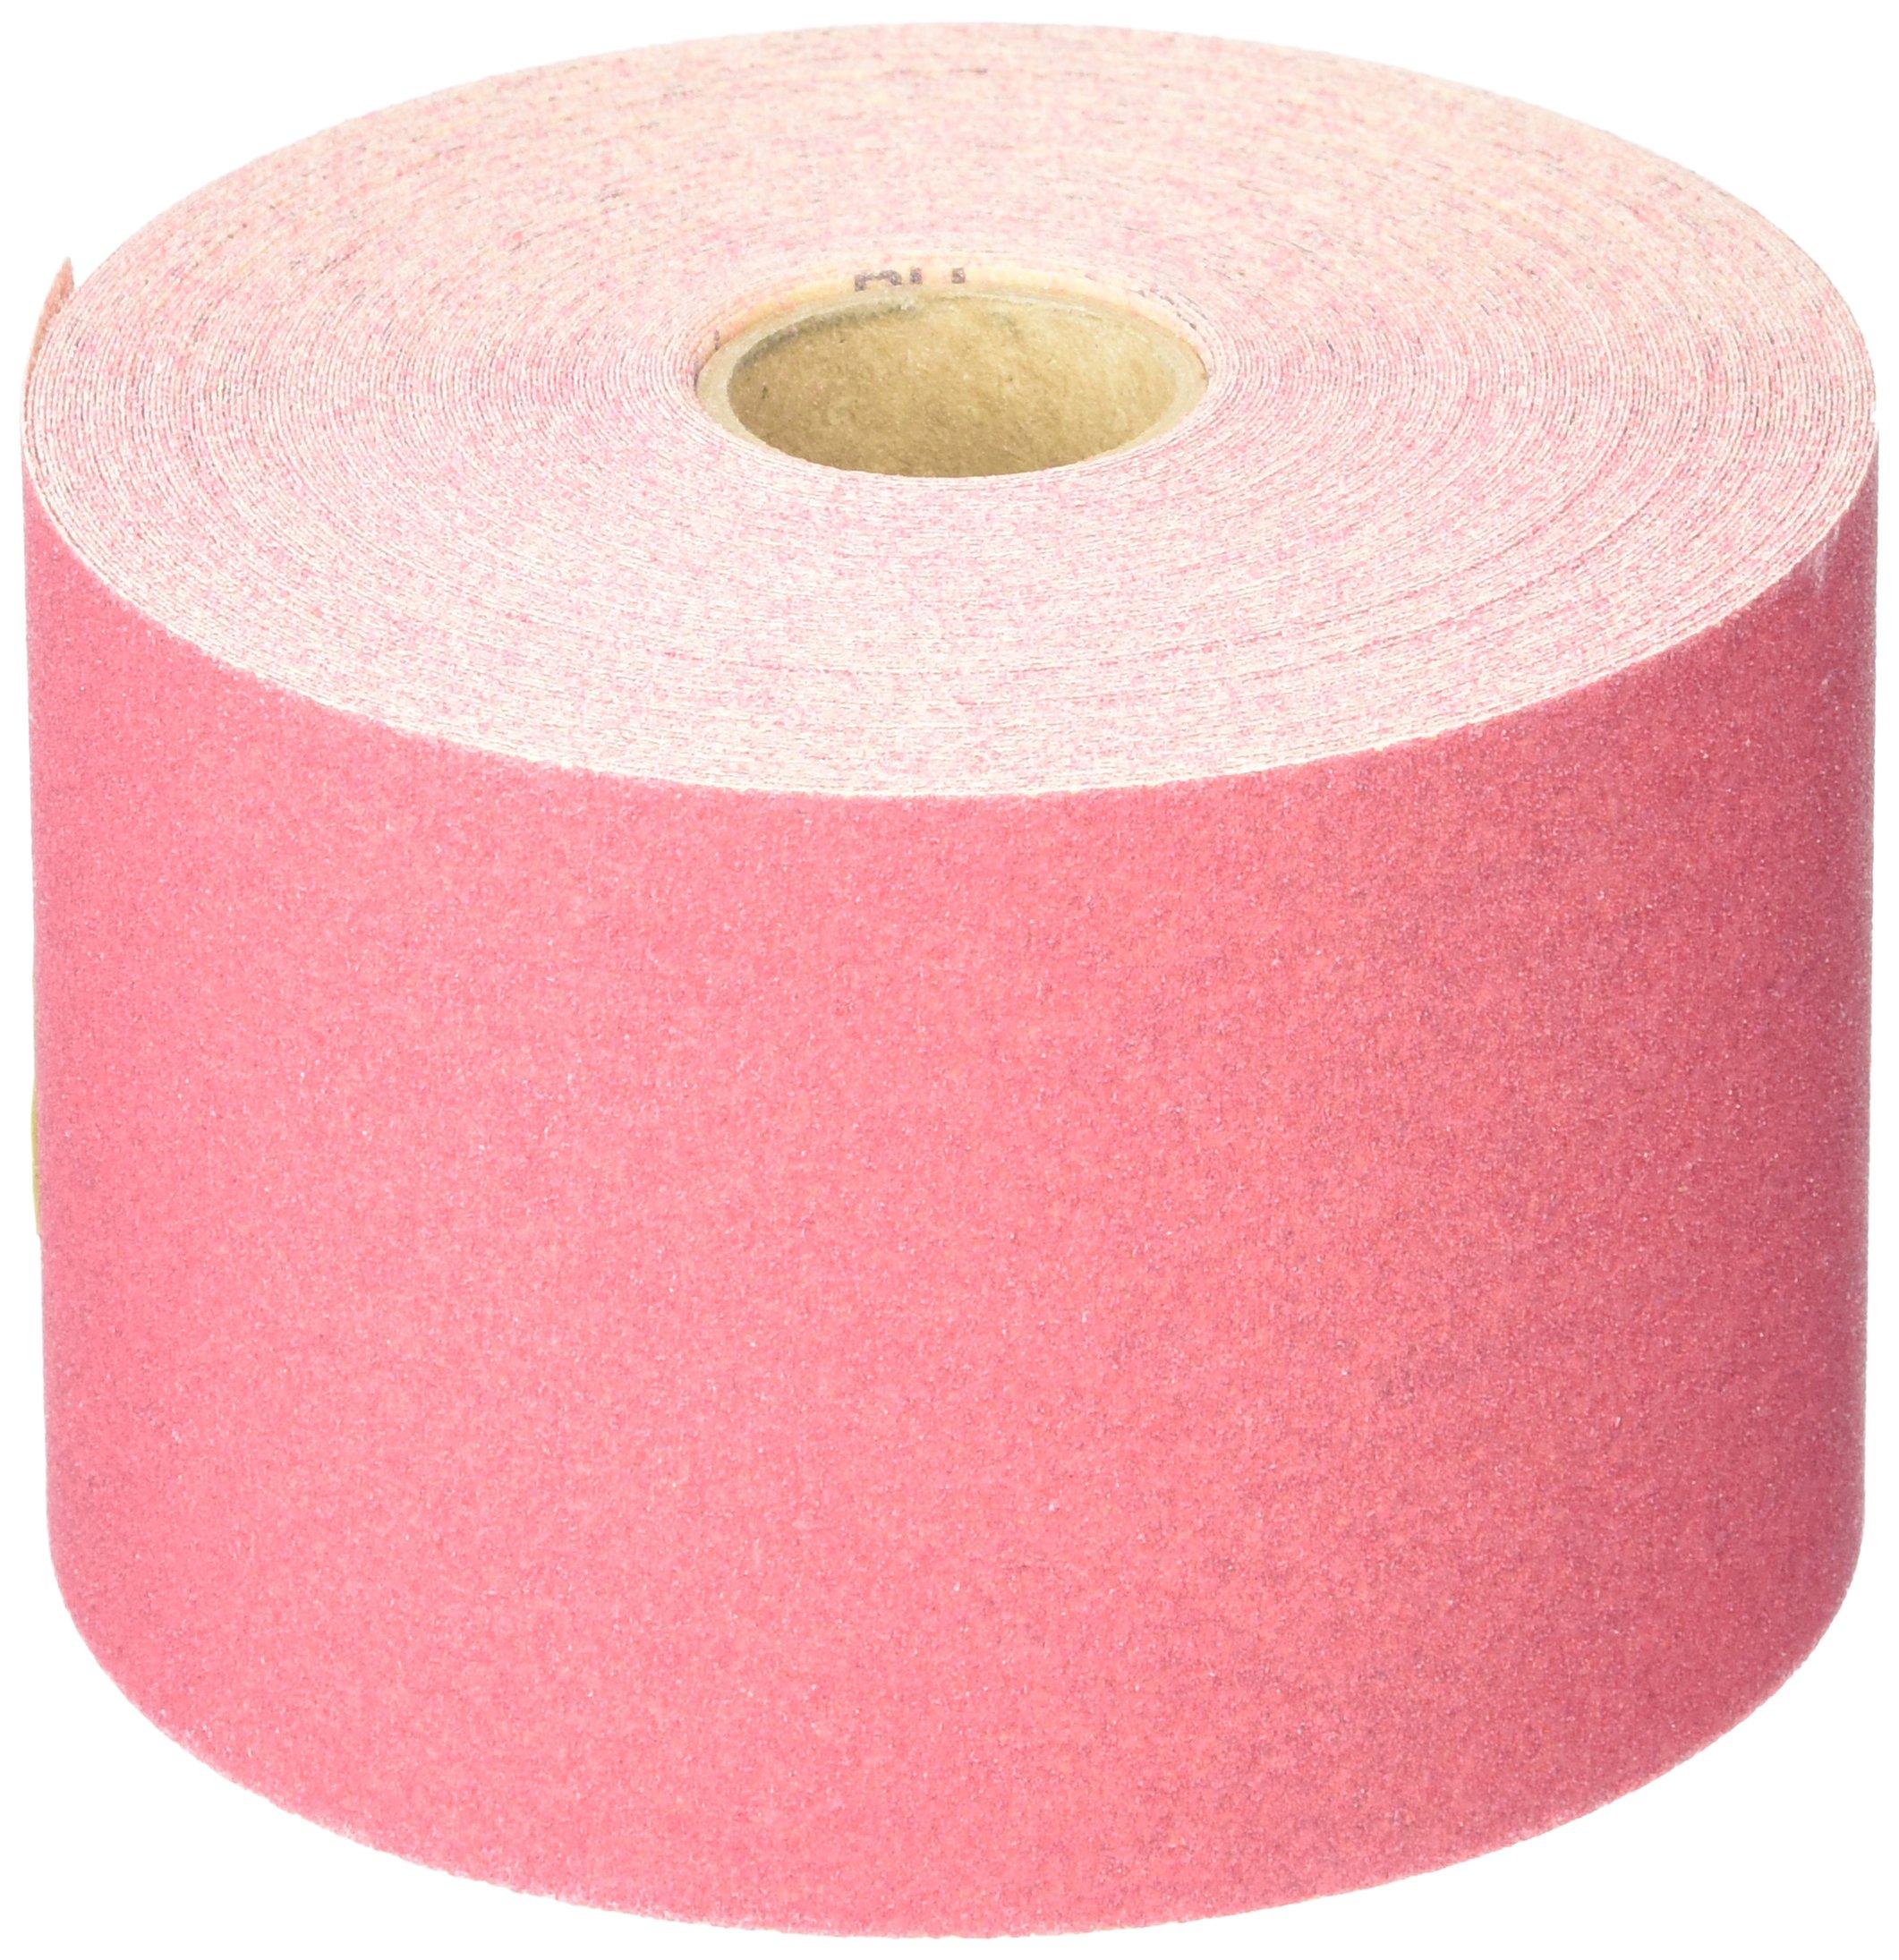 3M 01686 Stikit Red 2-3/4'' x 25 Yard P150 Grit Abrasive Sheet Roll by 3M